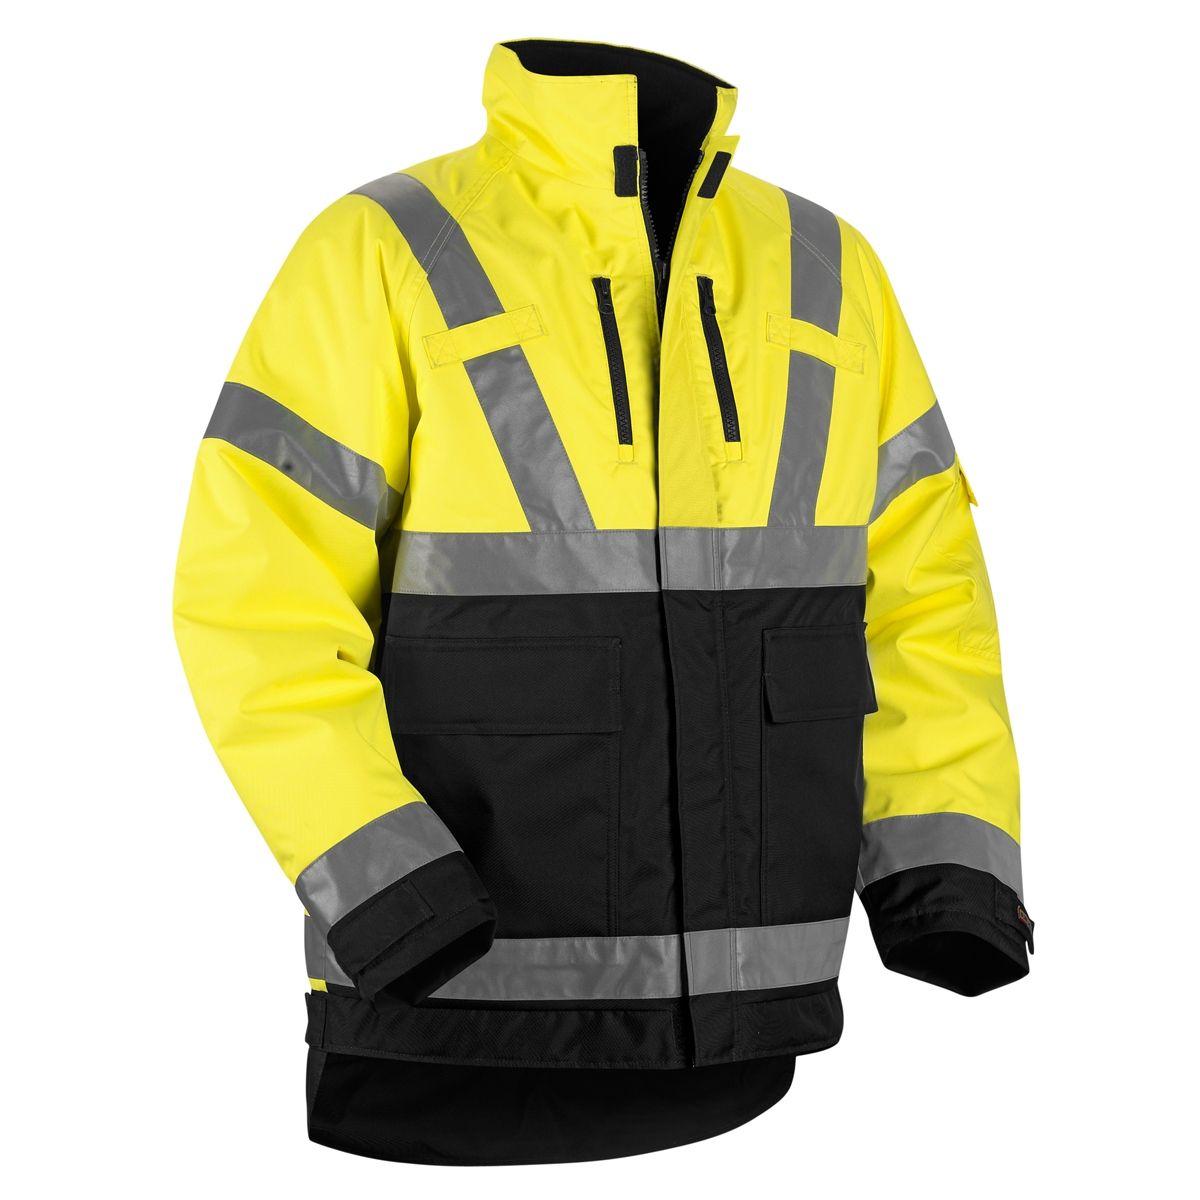 Blaklader 4927 Hi Vis Winter Jacket Yellow Black Winter Jackets Jackets Work Wear